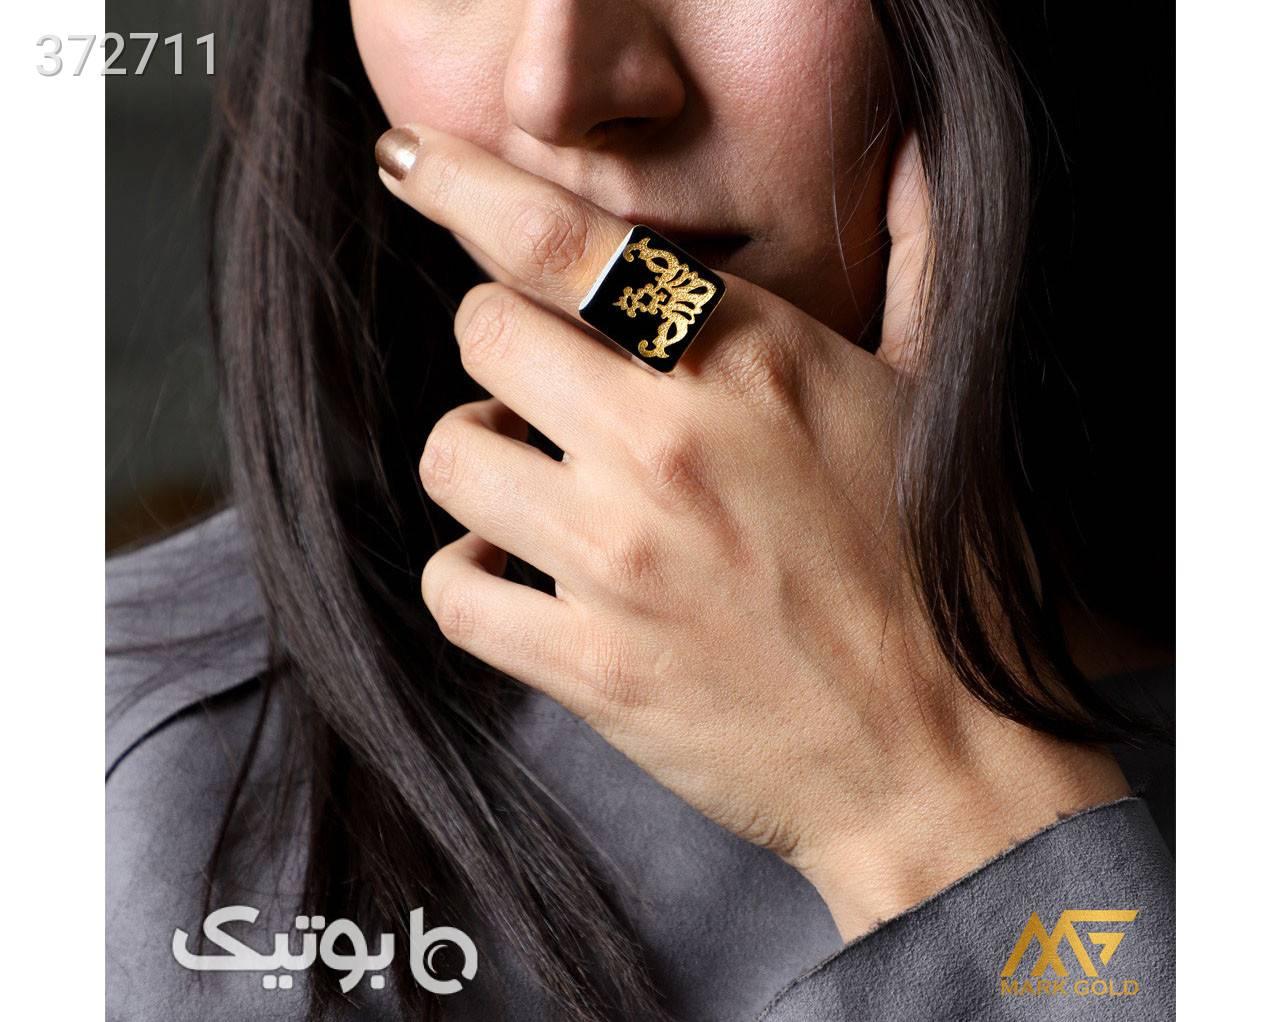 RA03 انگشتر طلاکوب طرح گلوریا مشکی انگشتر